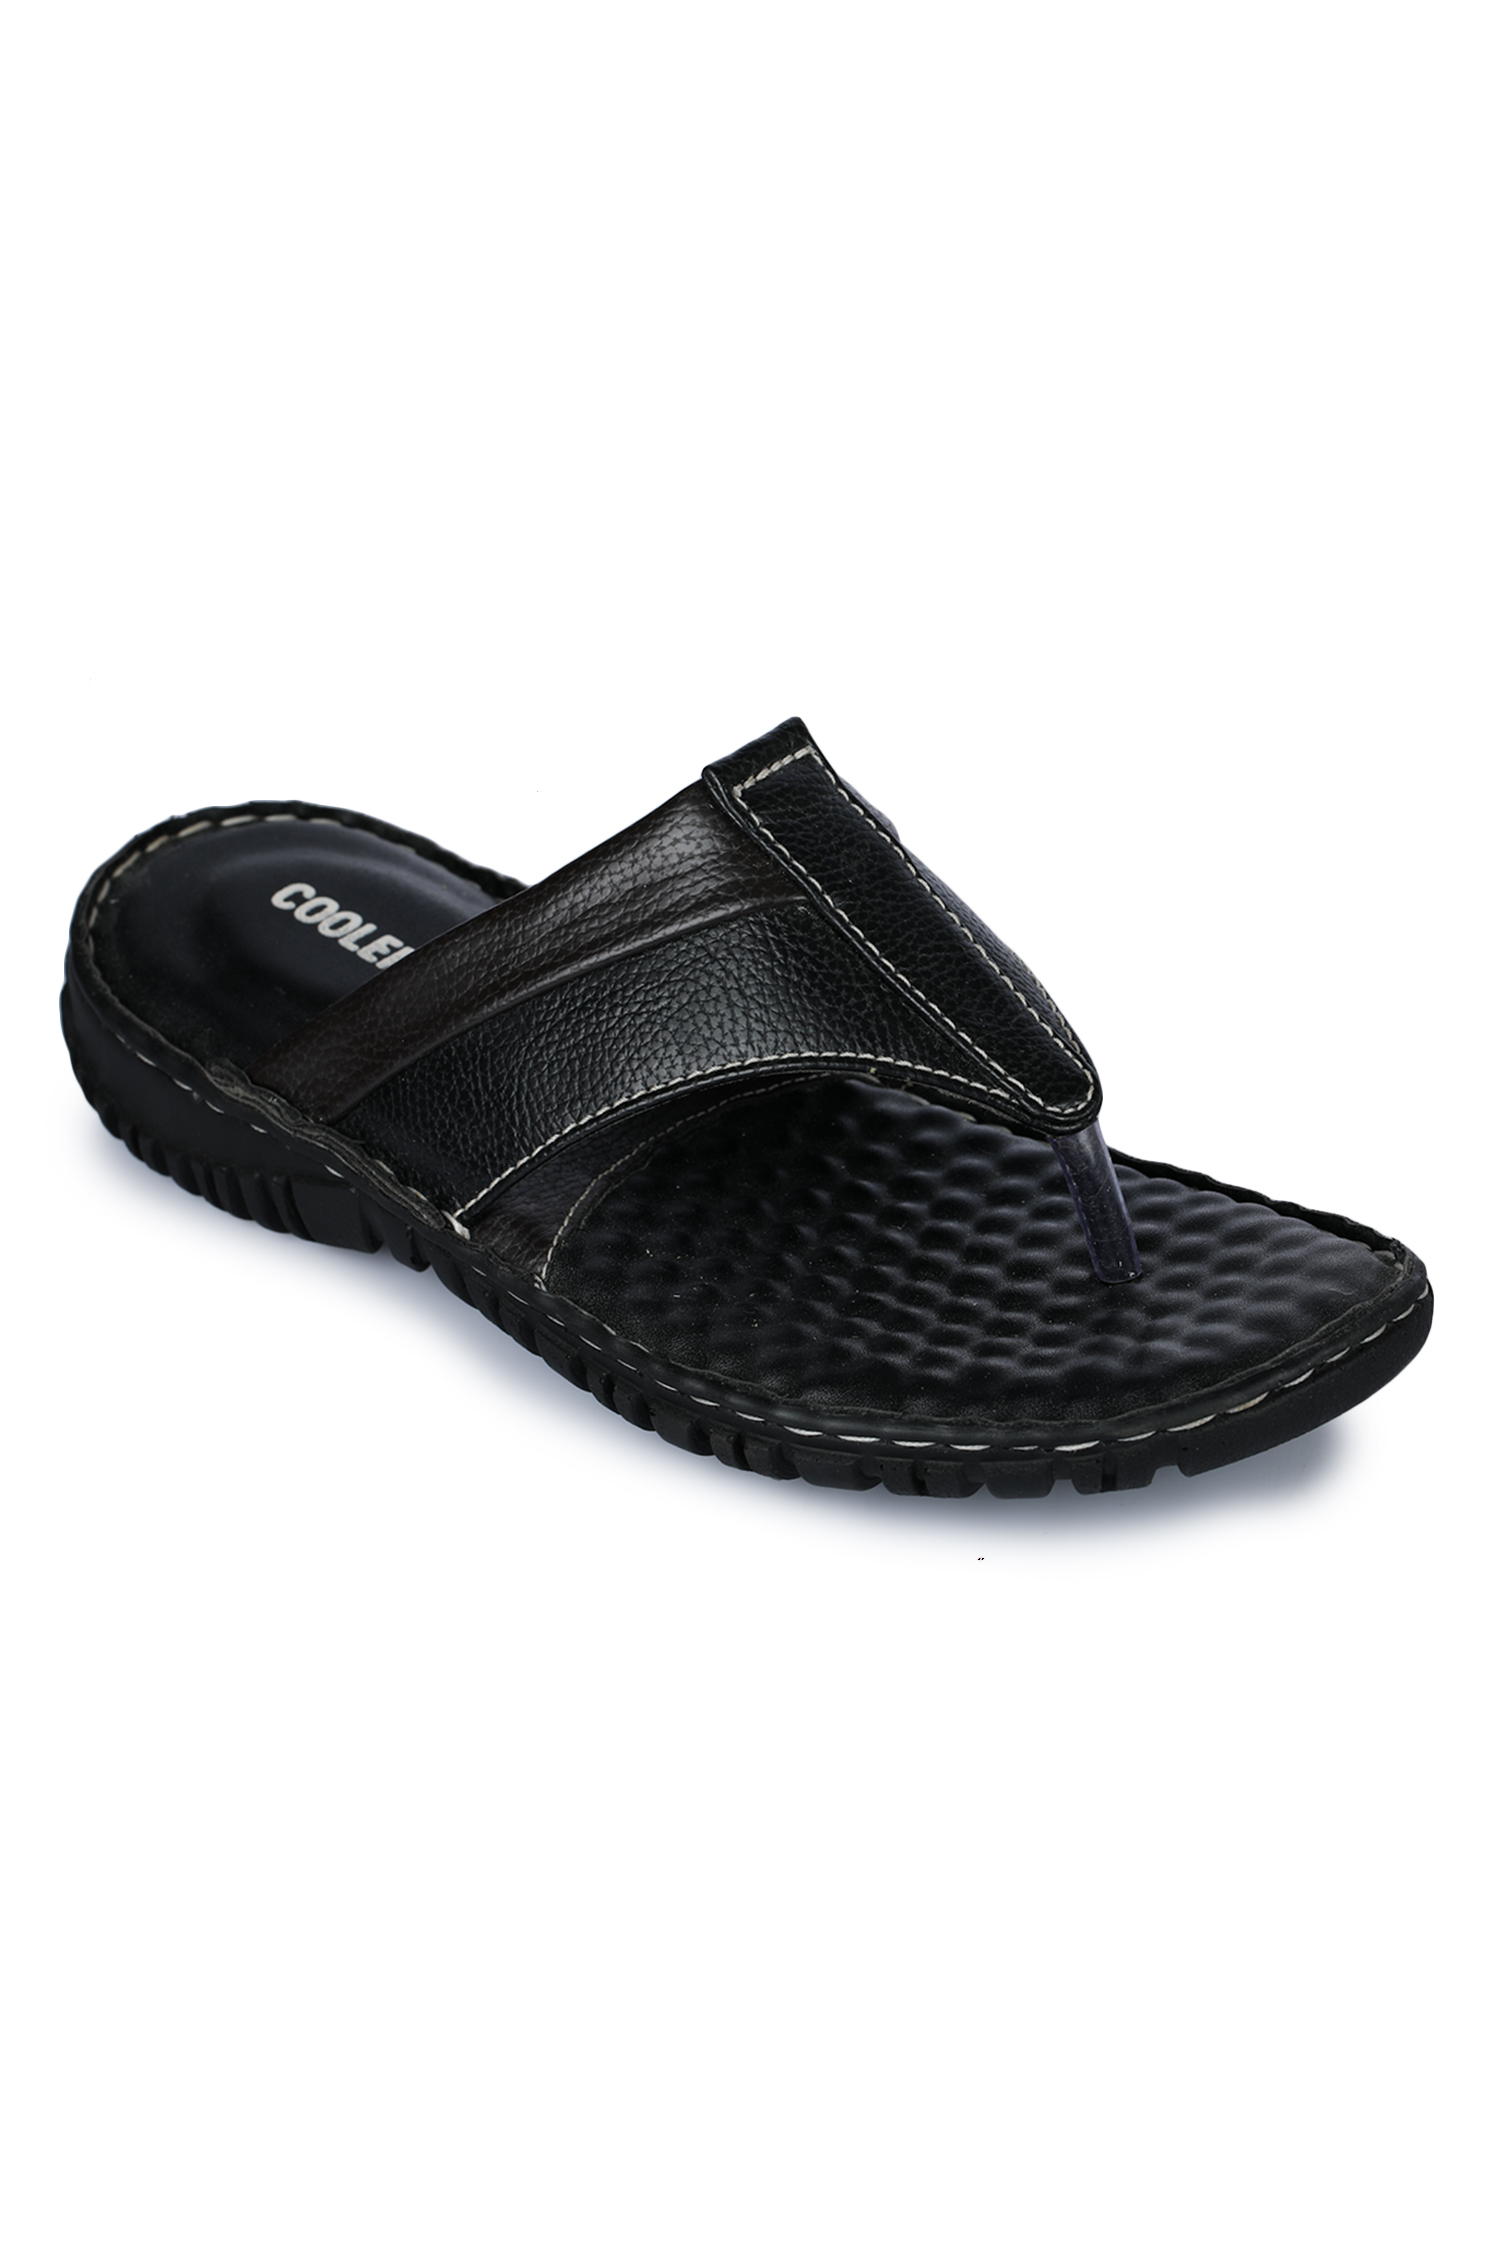 Liberty | Liberty Coolers Black Flip Flops CSS-010_Black For - Men